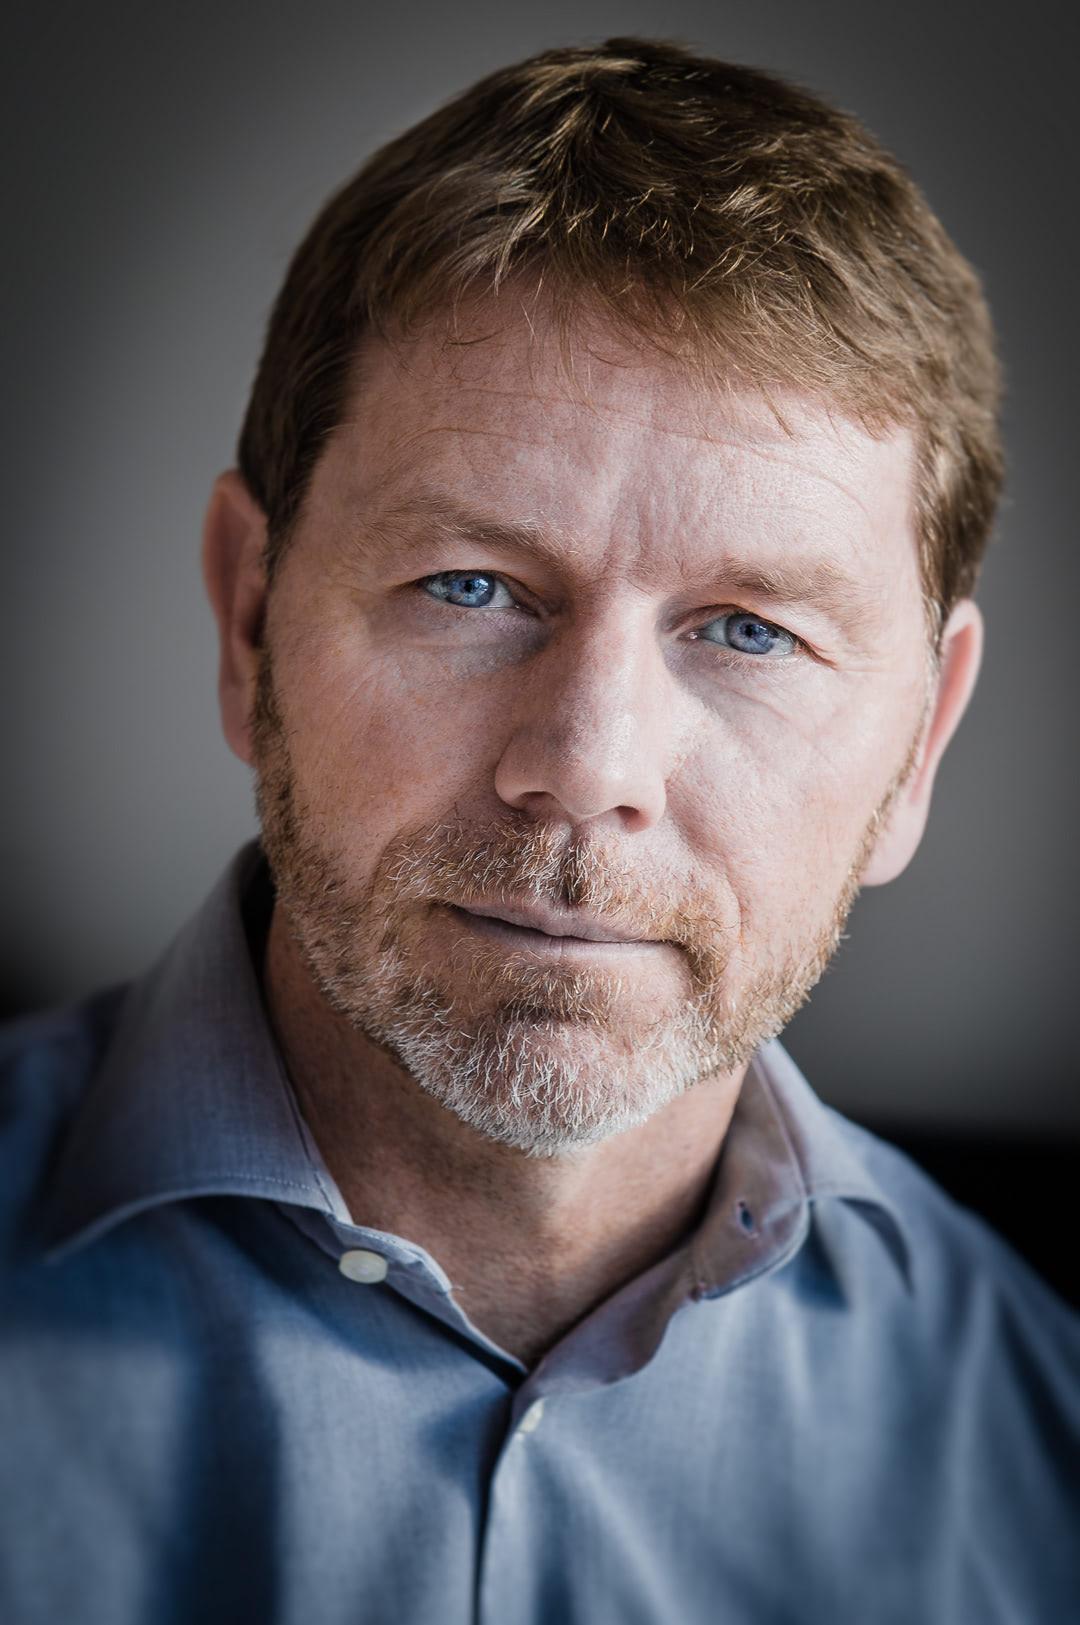 Prof. Dr. Ulrich Schreiber